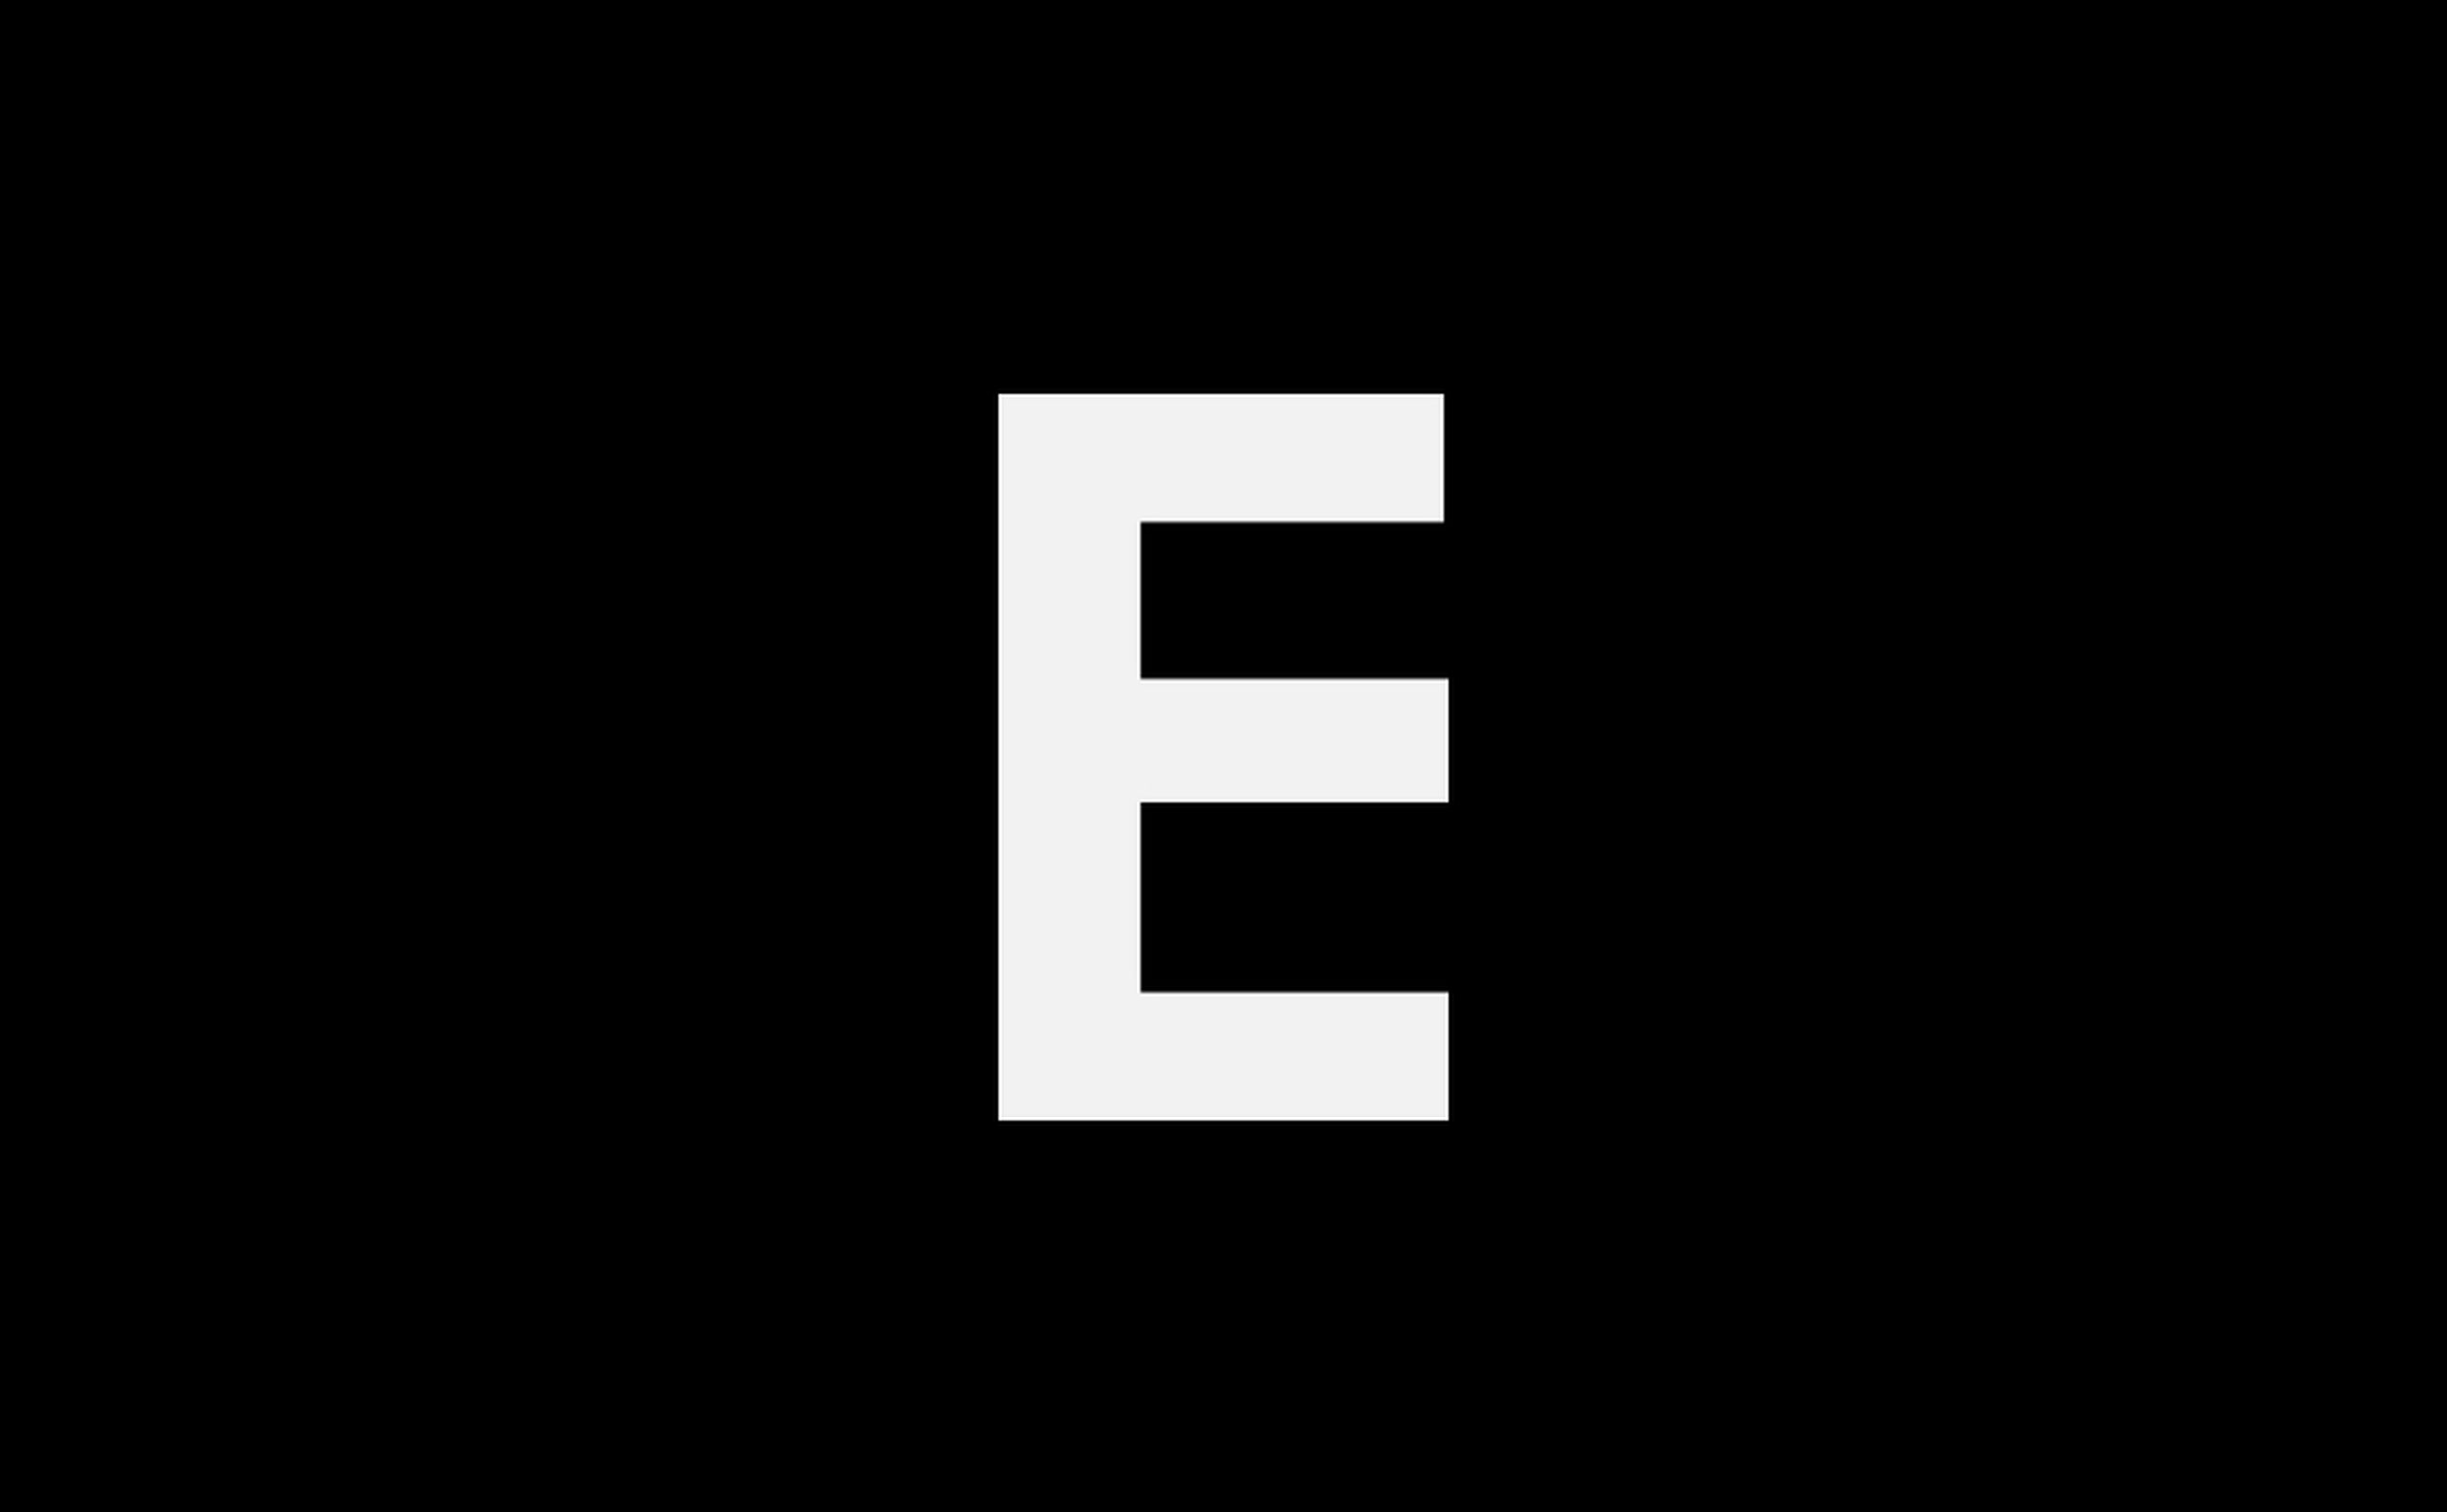 GRAFFITI ON WALL BY STREET